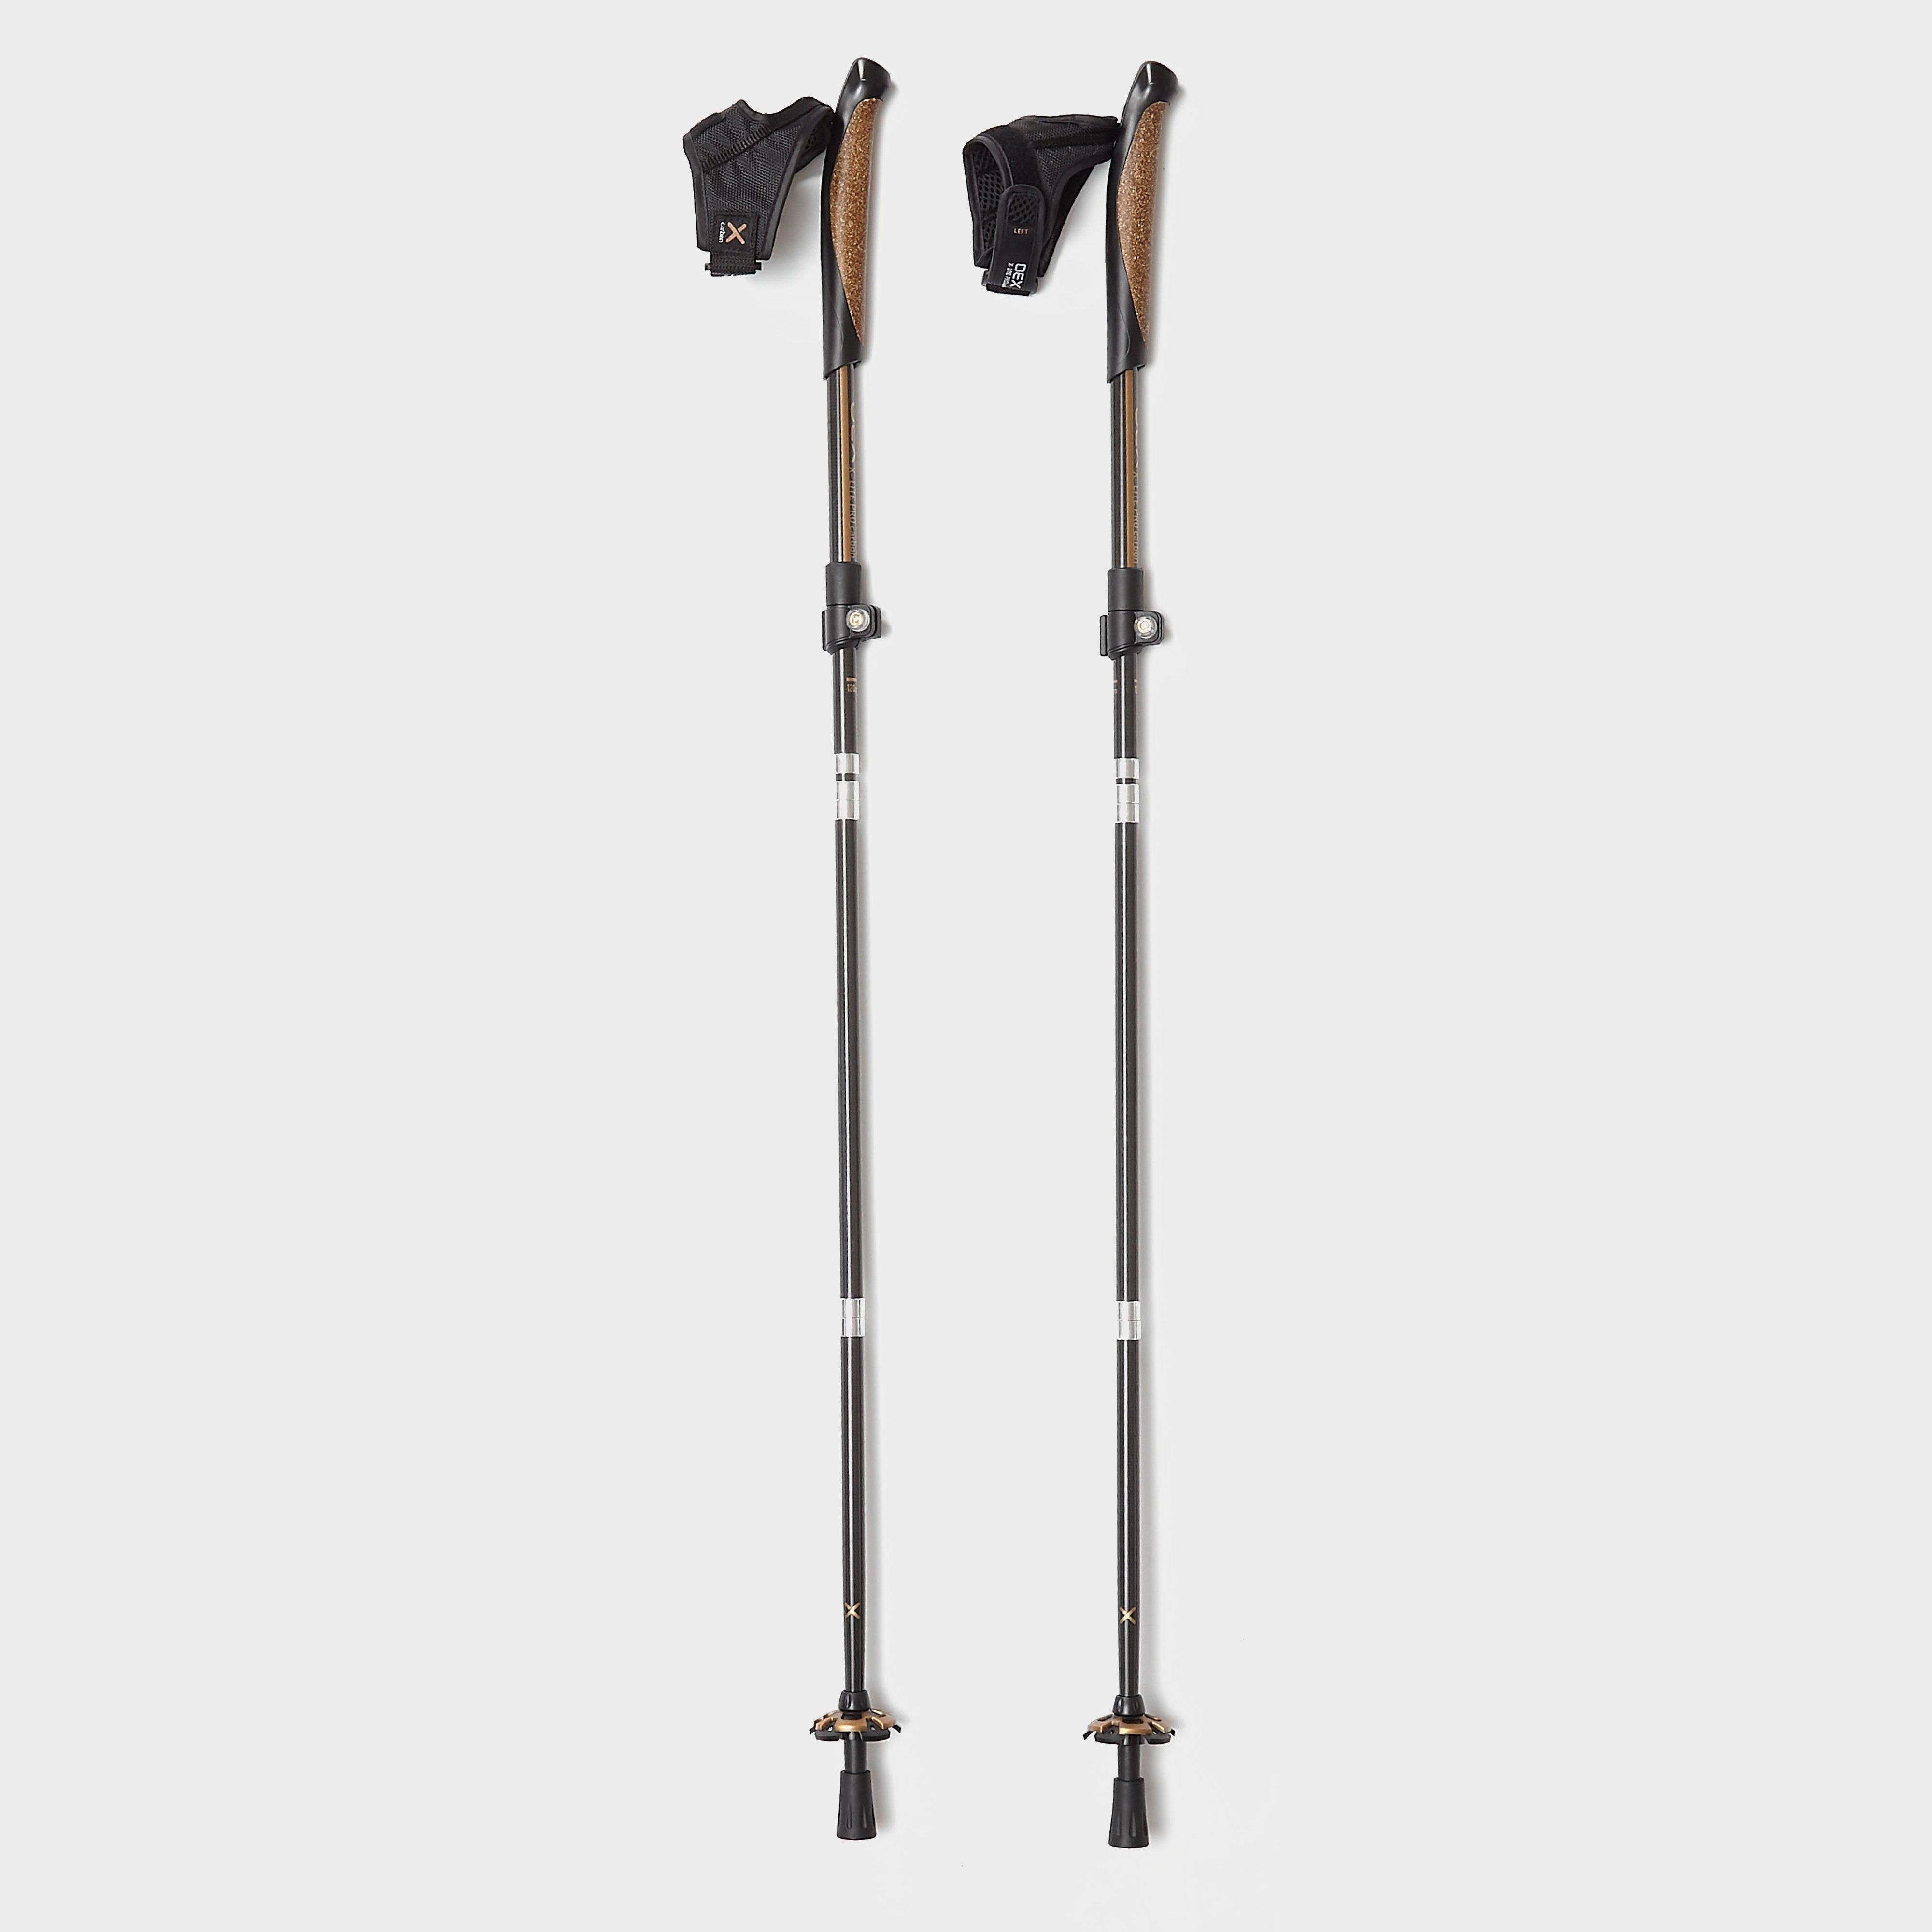 Oex Oex X-Lite Pro Carbon Walking Poles (Pair) - Black, Black